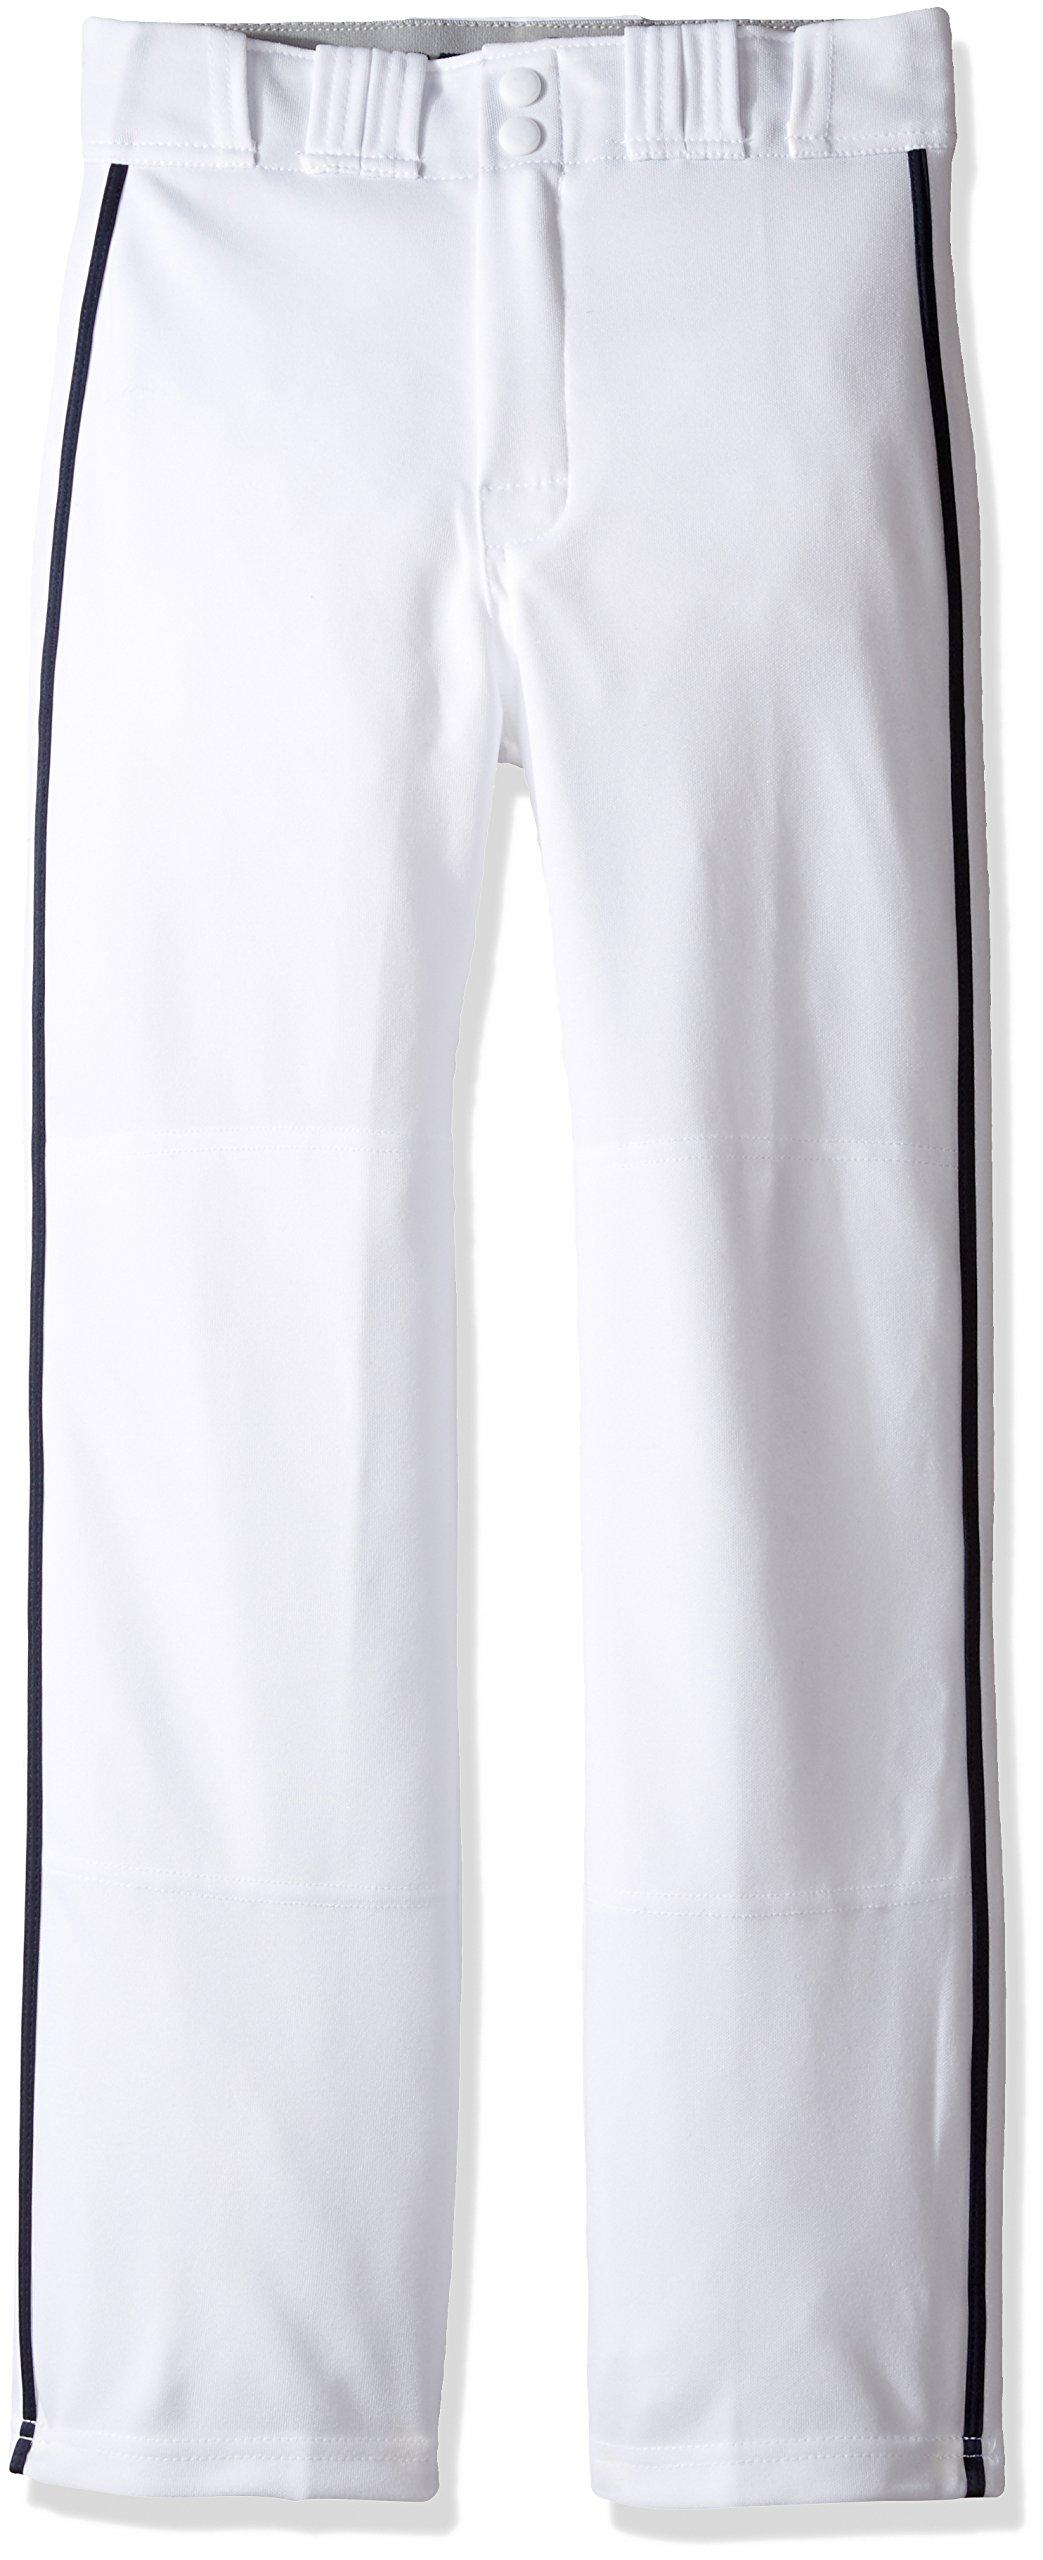 Easton Rival 2 Baseball Softball Pant | Youth | Small | White Navy | 2020 | Double Reinforced Knee | Elastic Waistband w/ 2 Color Internal Logo | 2 Batting Glove Pockets | 100% Polyester